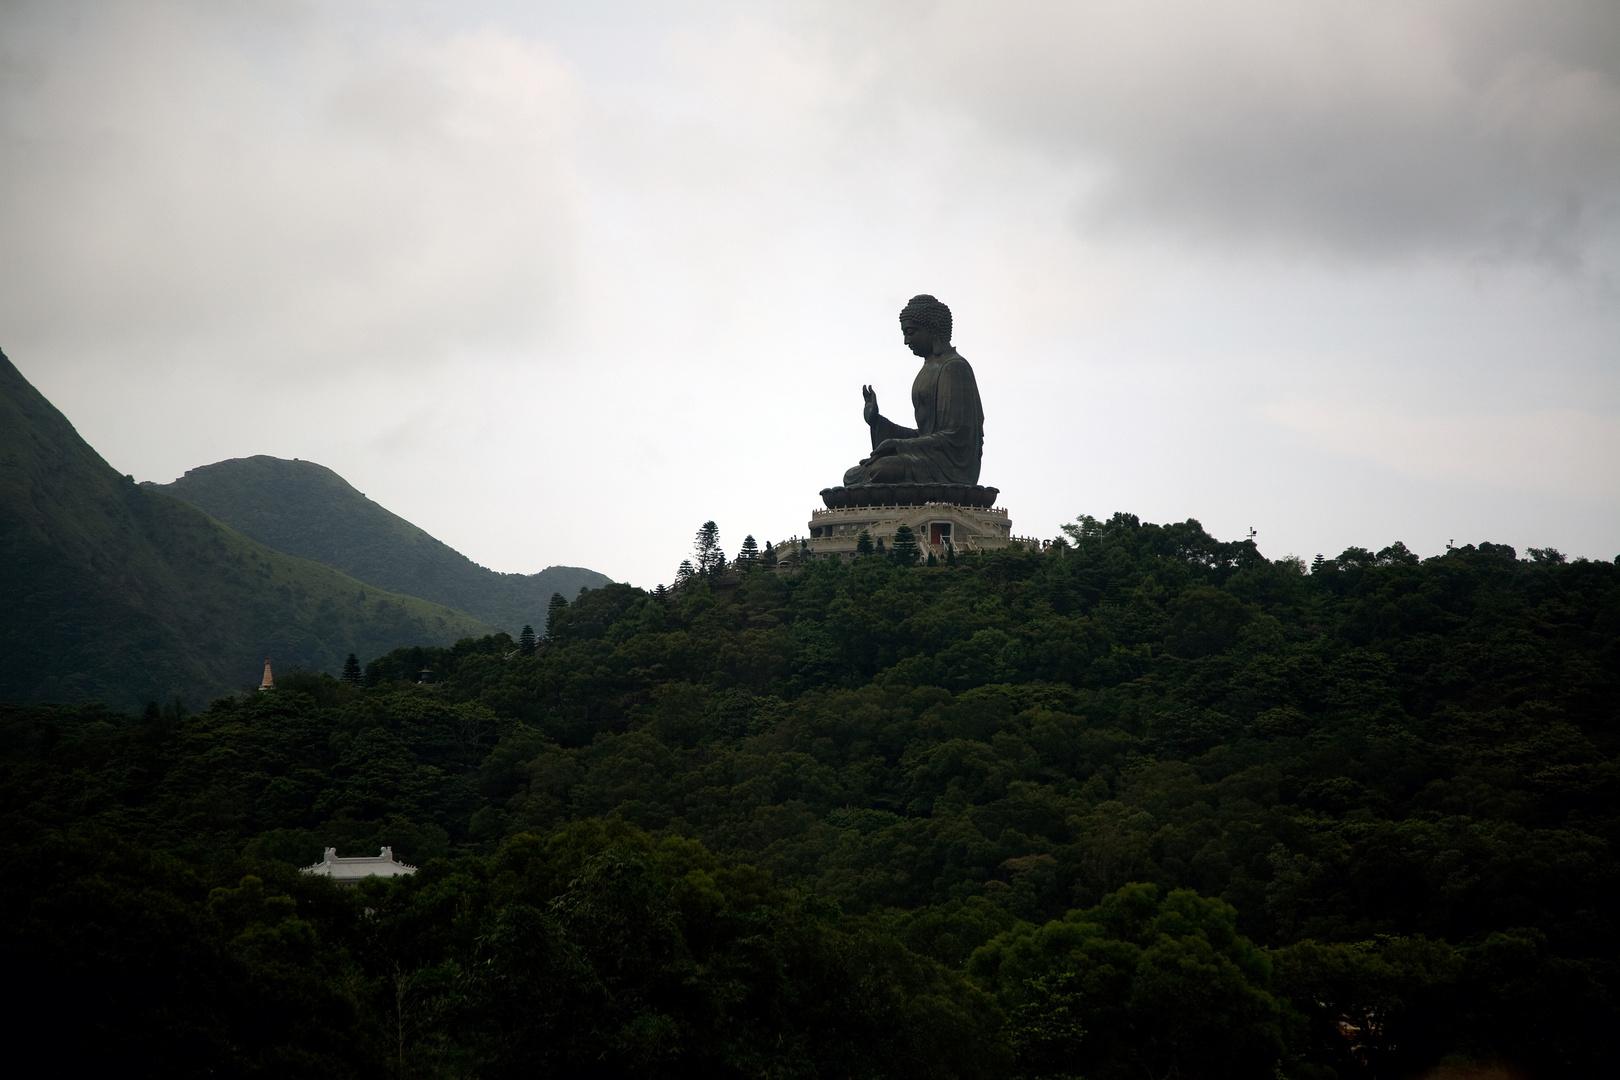 Lonesome Buddha